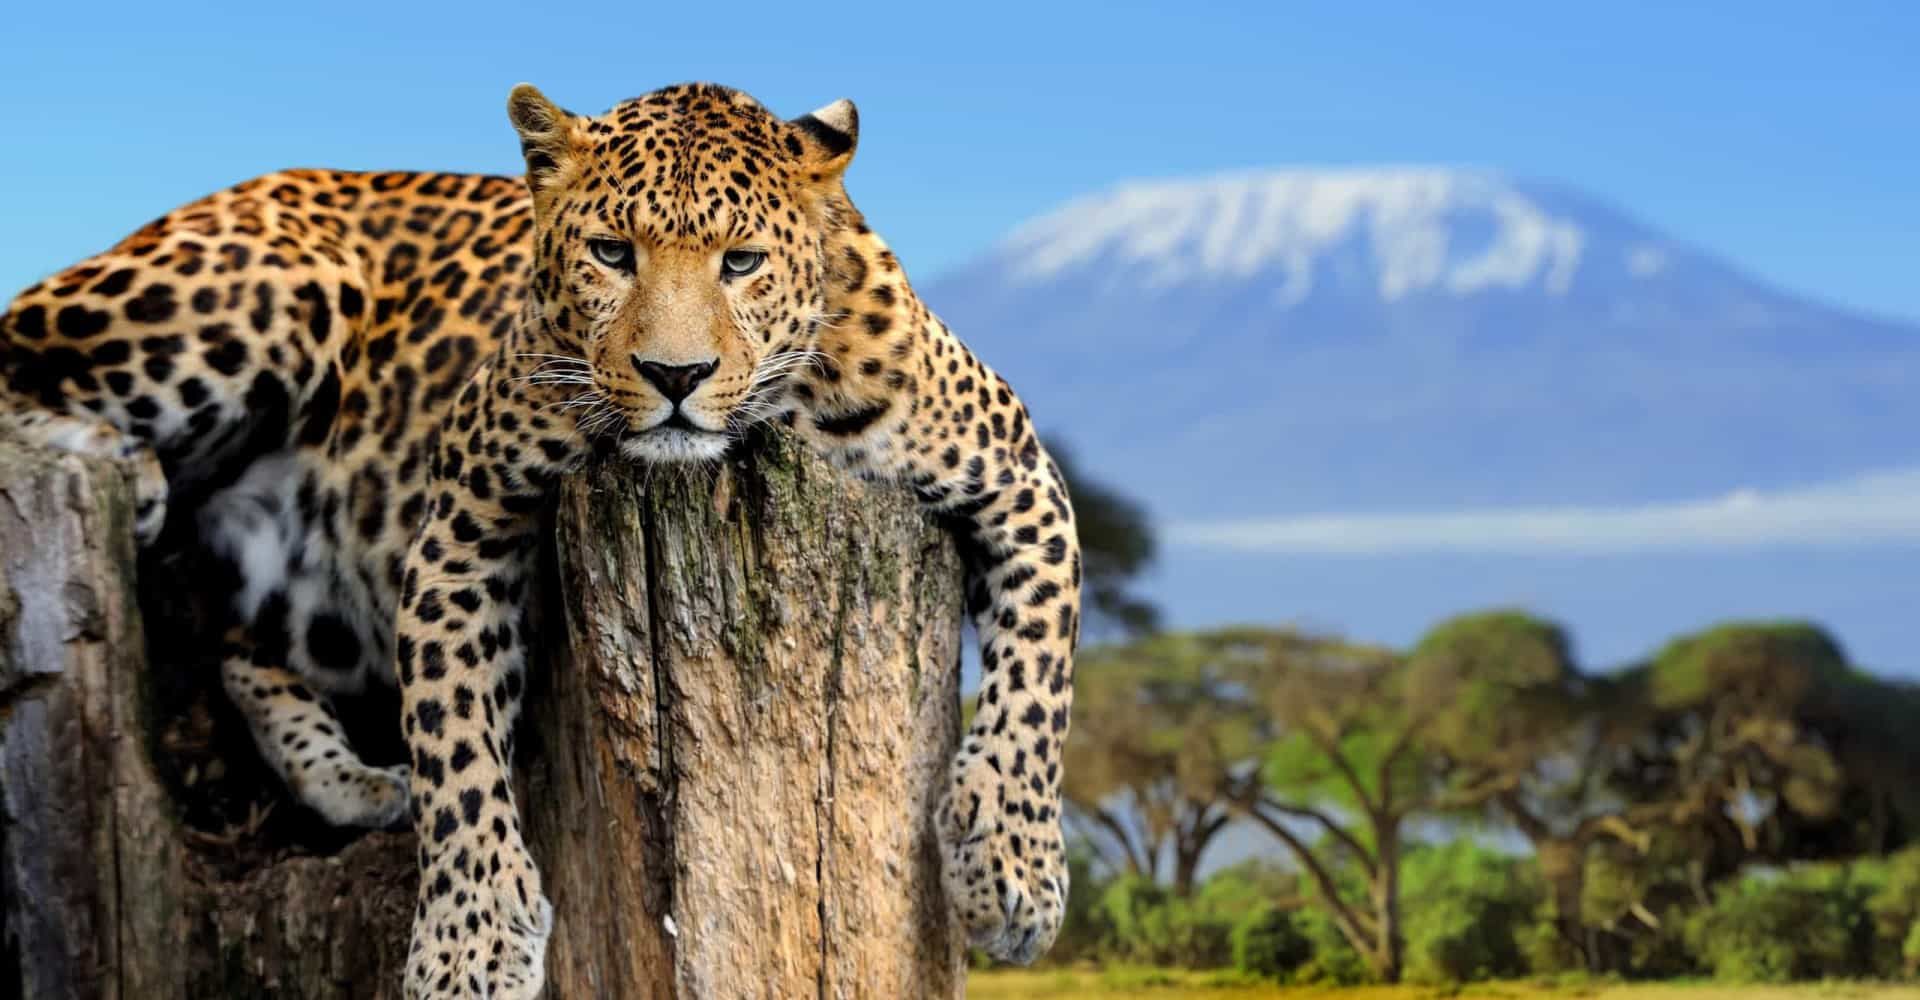 Tesouros africanos: veja as paisagens deslumbrantes deste continente!